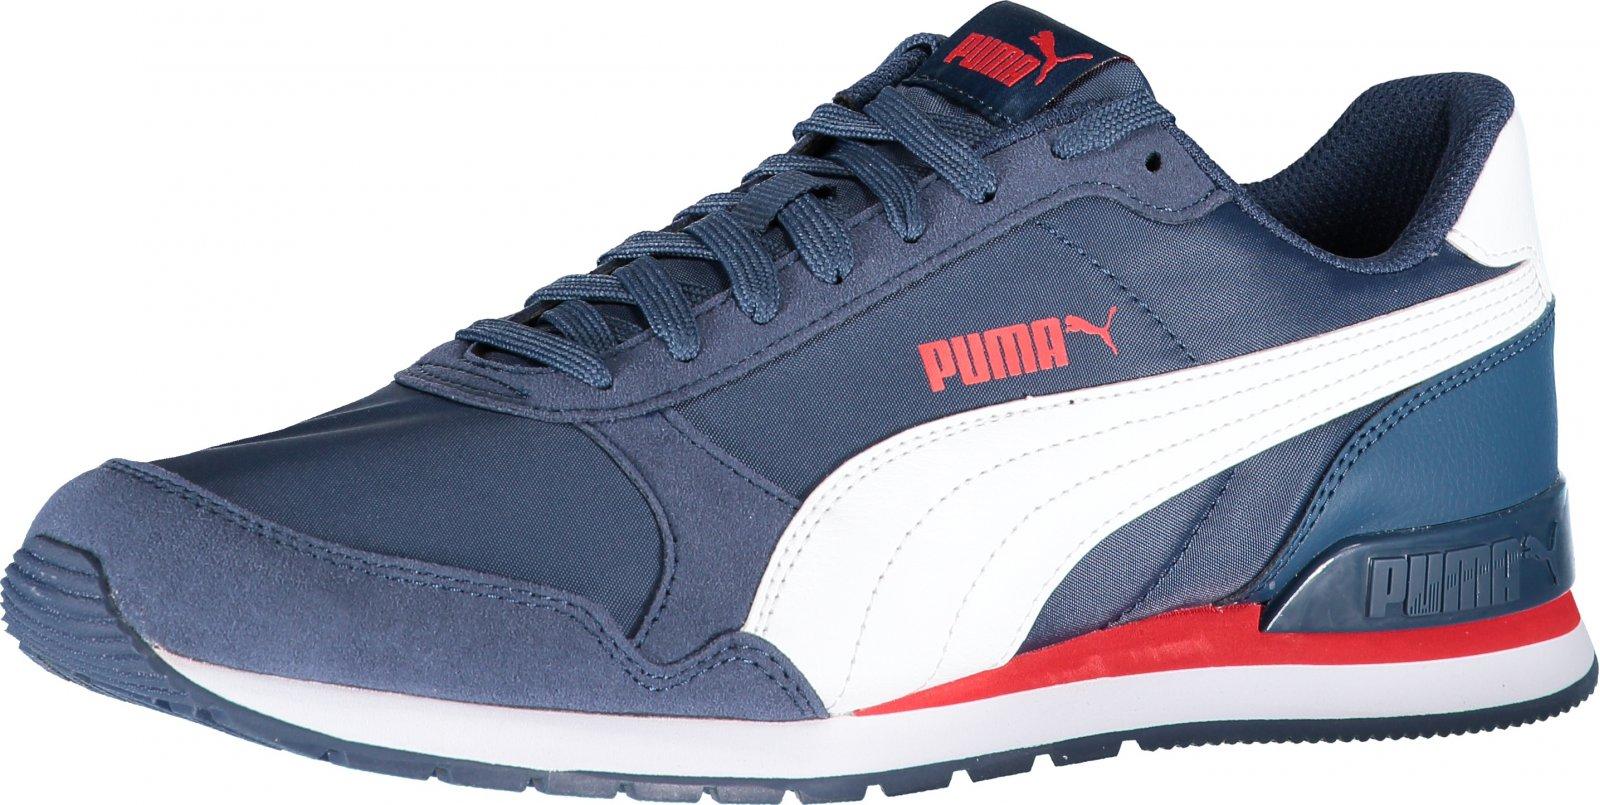 Puma ST Runner V2 NL 36527803 Sargasso